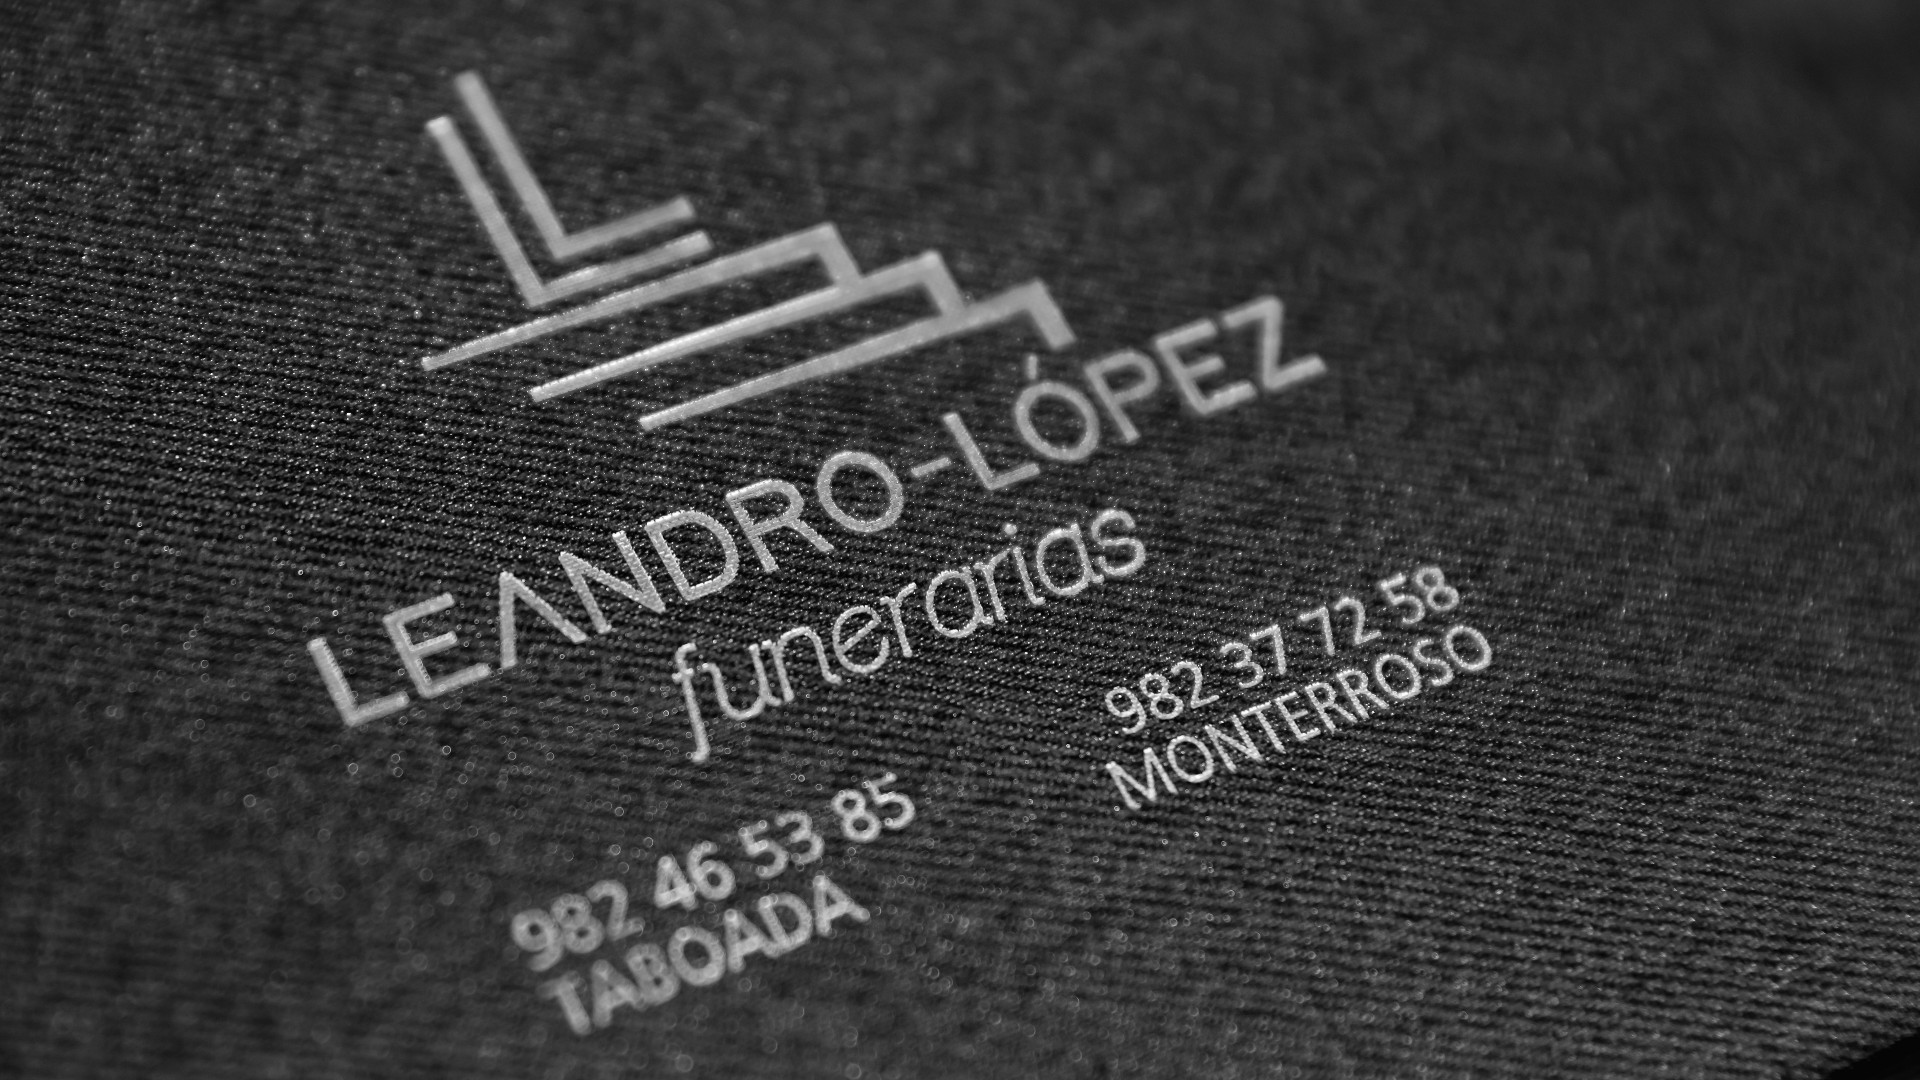 funerarias-leandro-lopez-slide-04-1920x1080